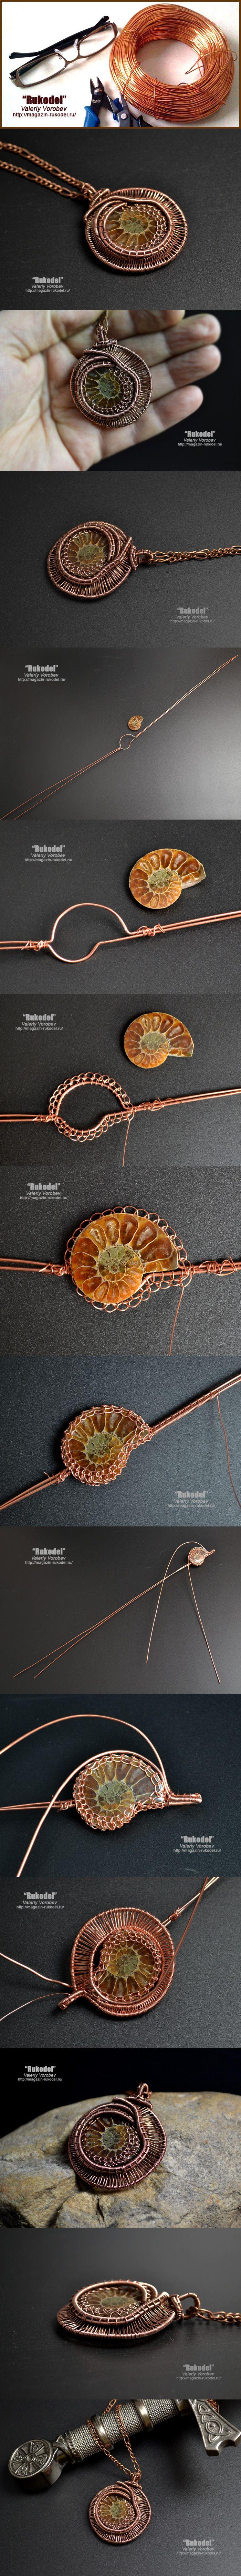 Wire Wrap Pendant. Ammonite fossil slice Madagascar.                                                                                                                                                                                 More